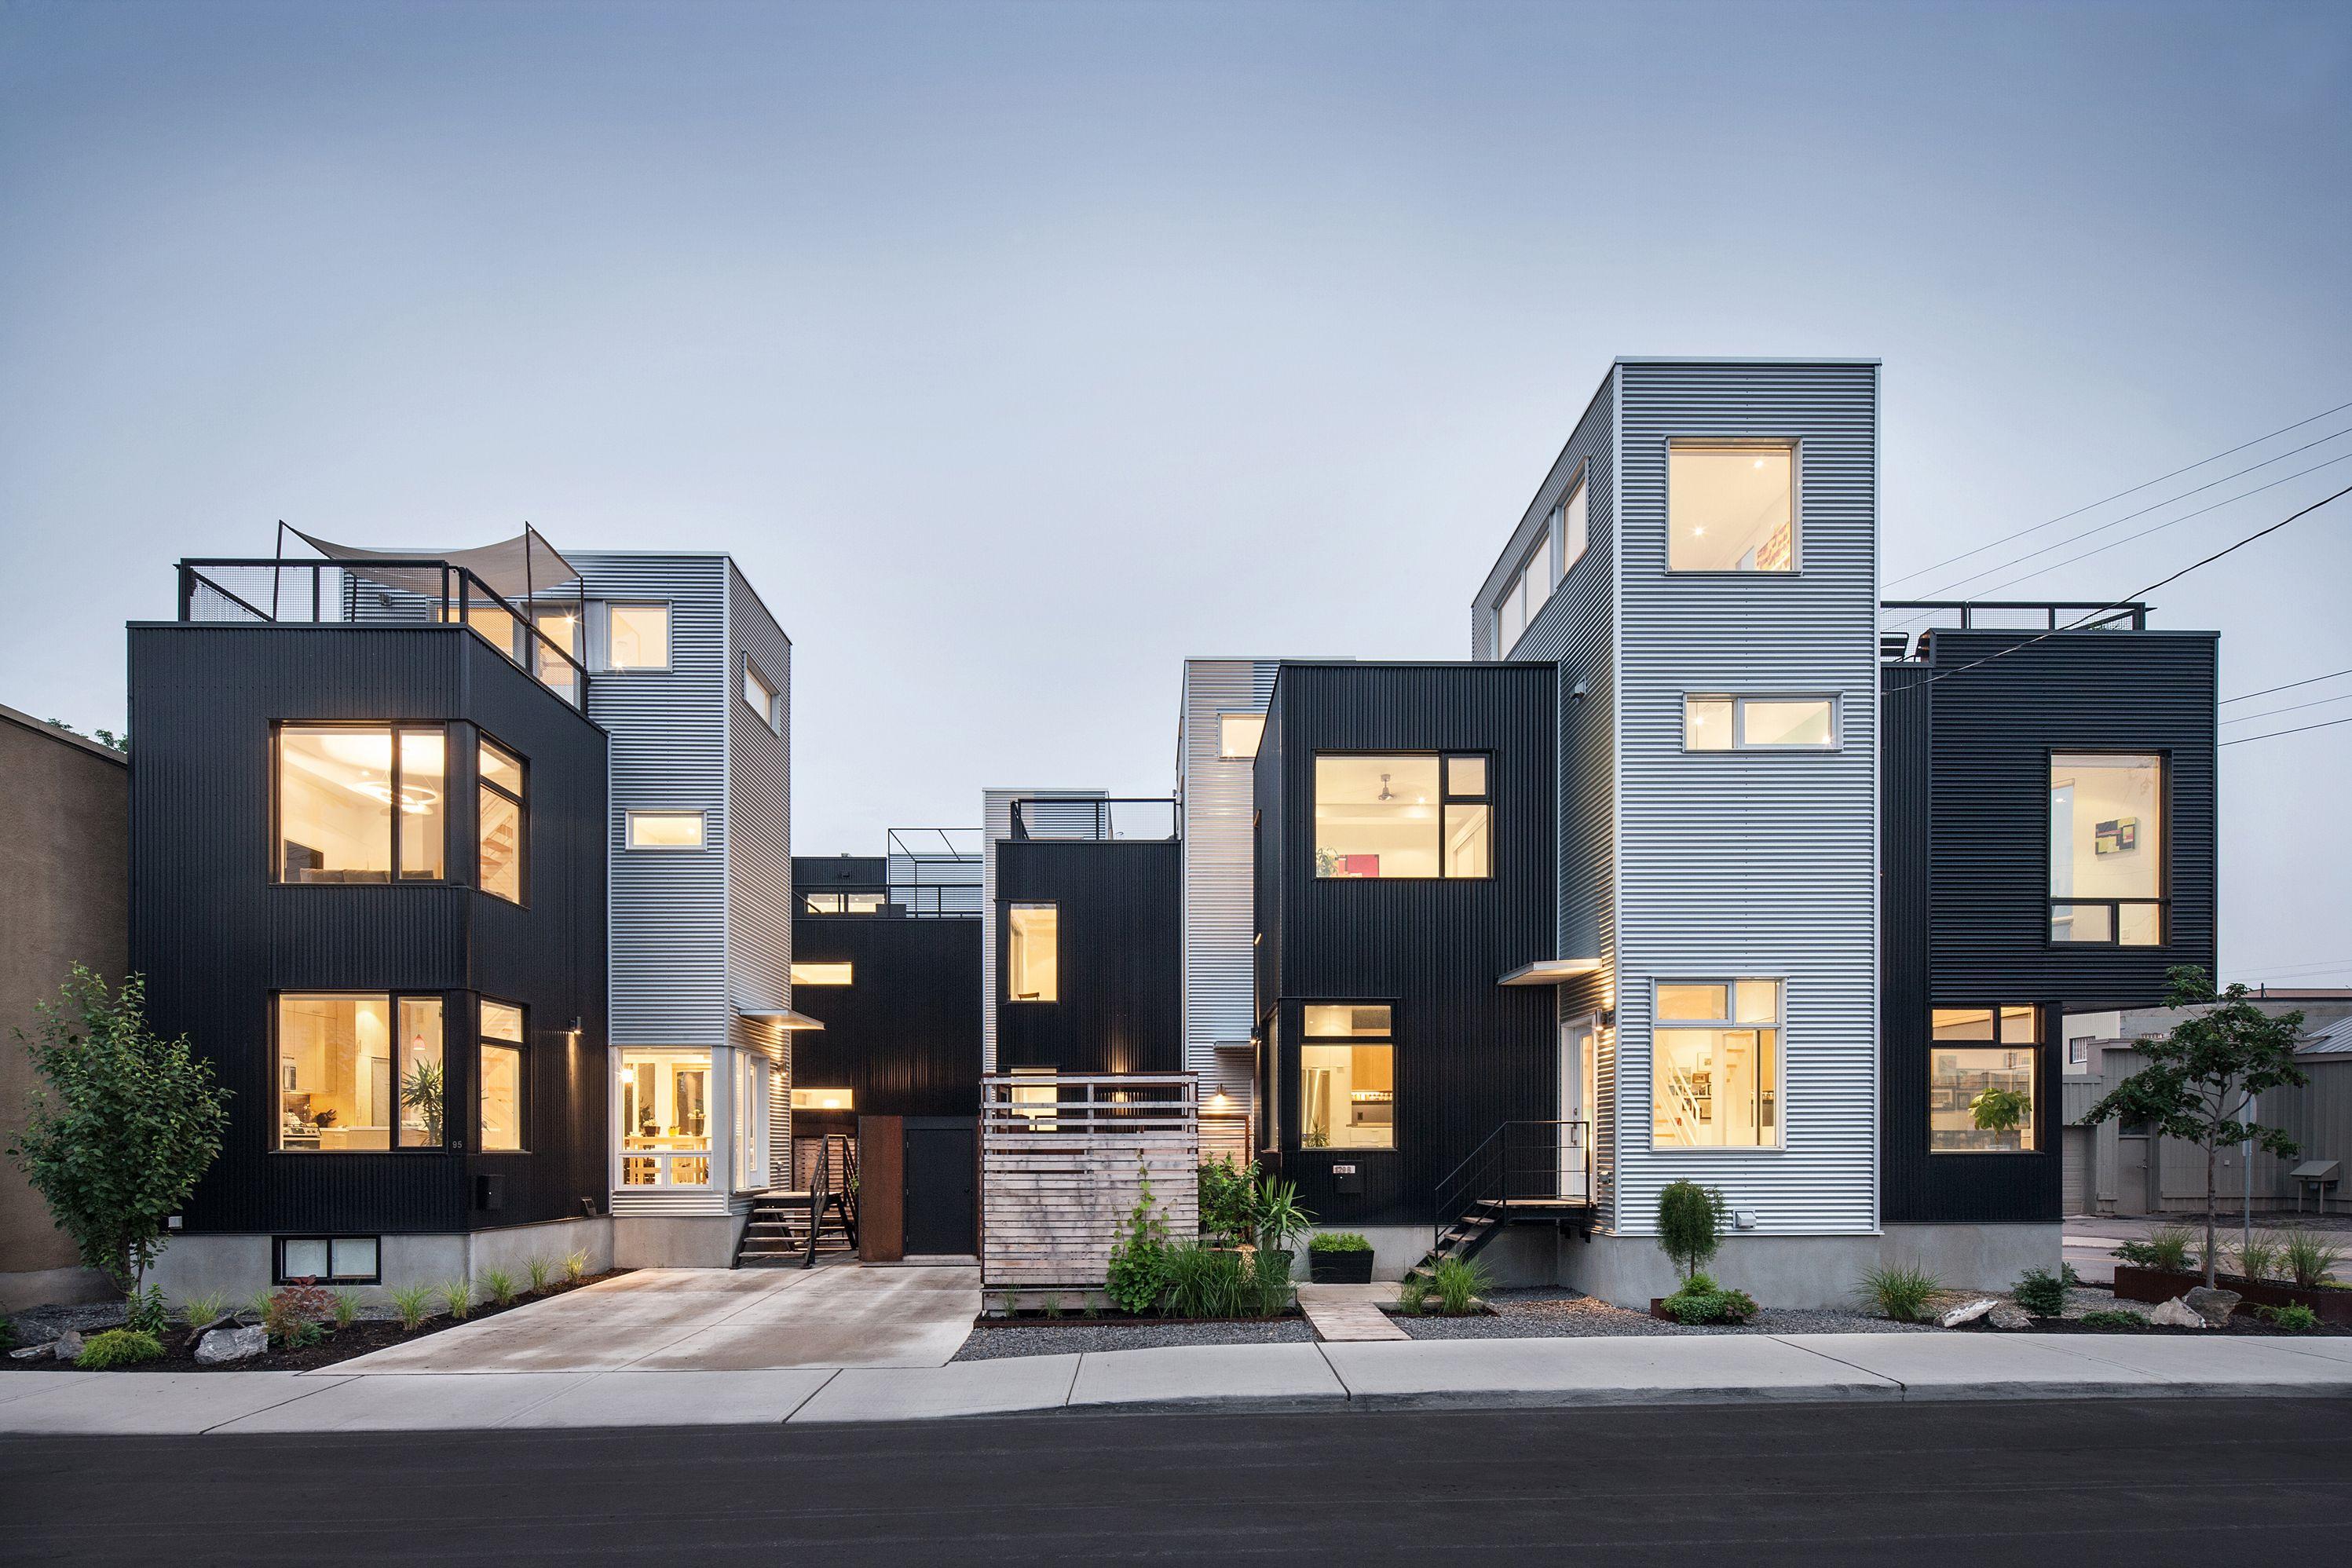 colizzabruni modern hintonburg infill metalsiding home colizzabruni modern hintonburg infill metalsiding home design modernlandscaping